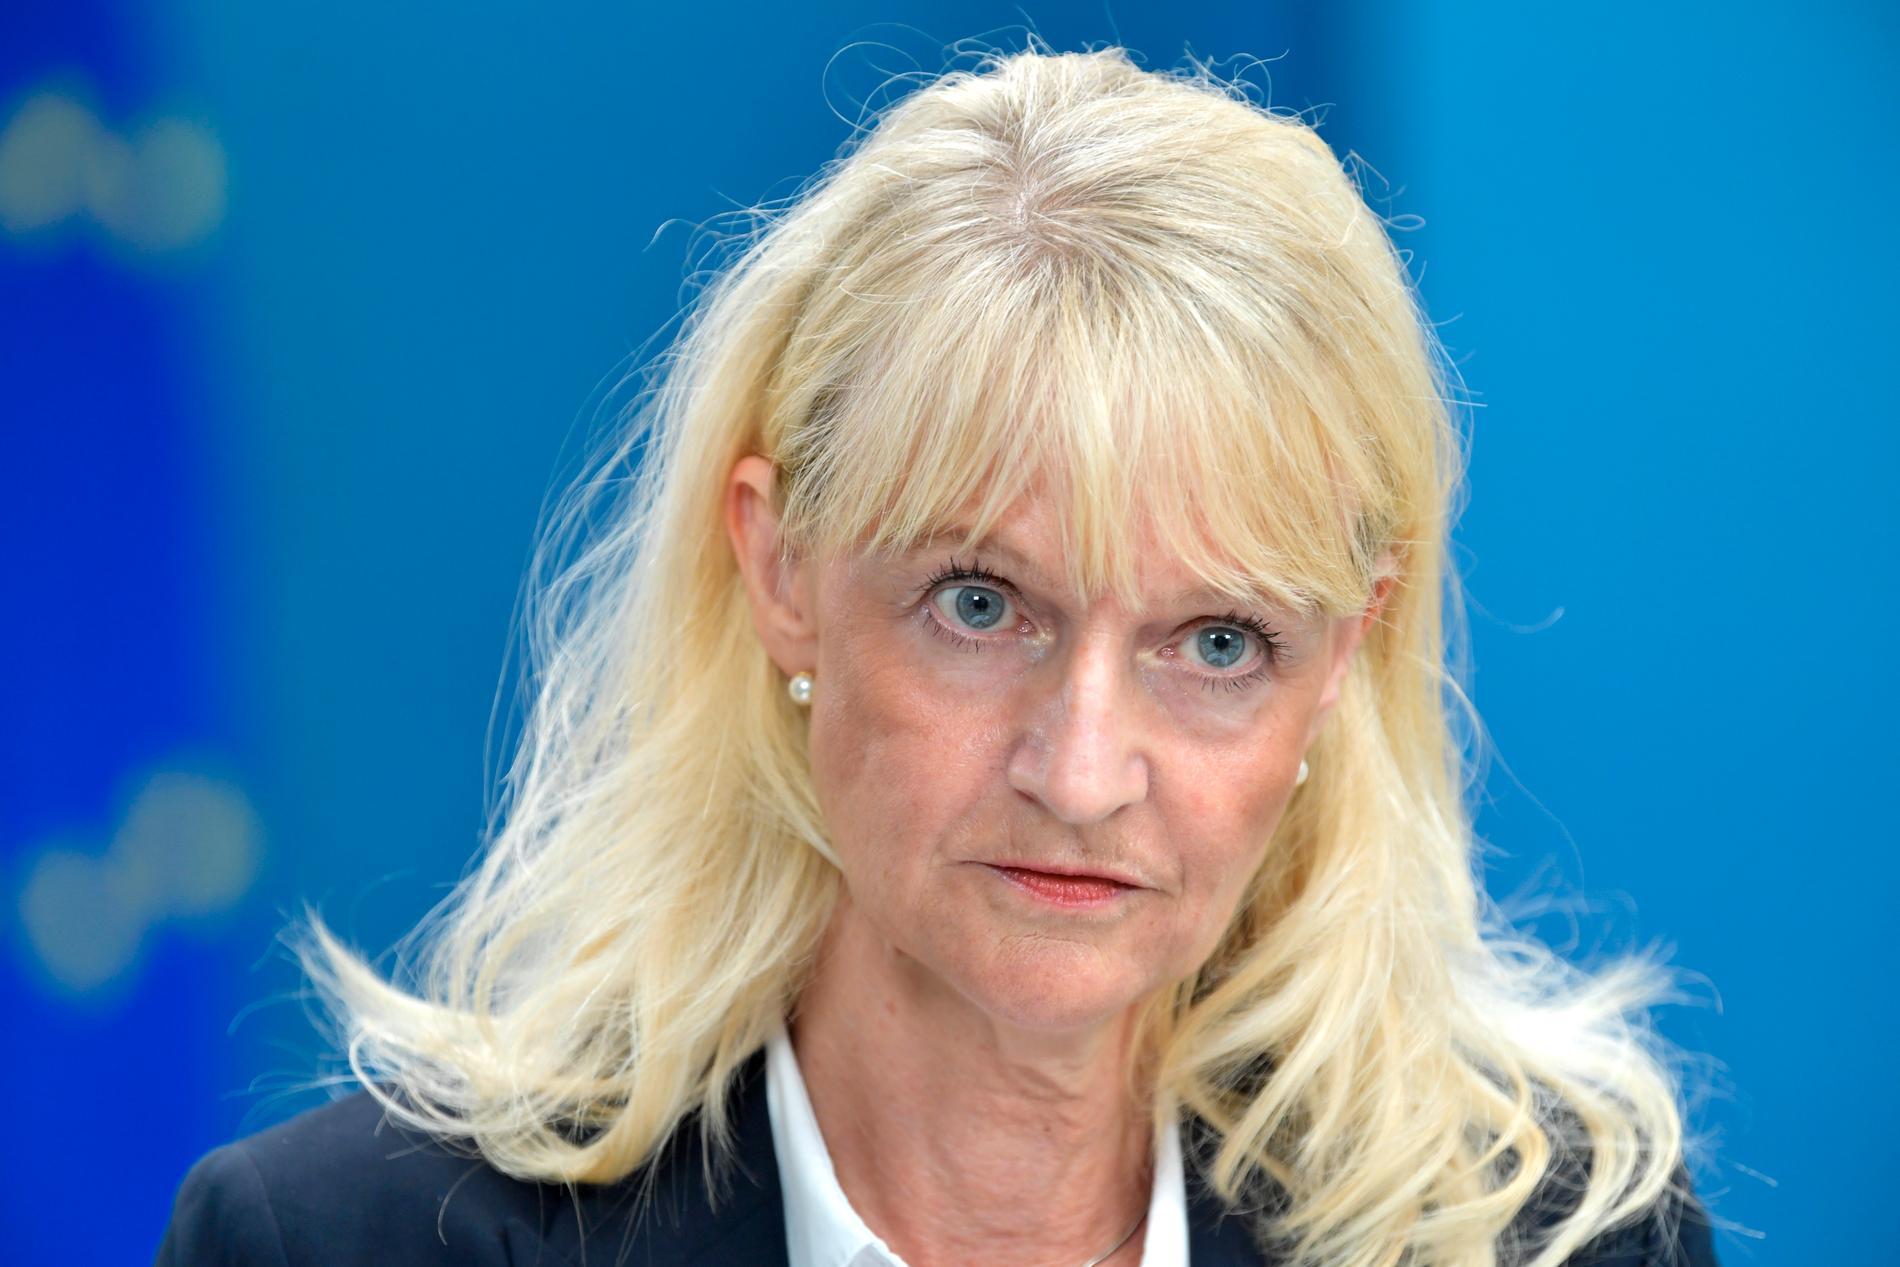 Charlotte von Essen har utsetts till ny säkerhetspolischef. Arkivbild.